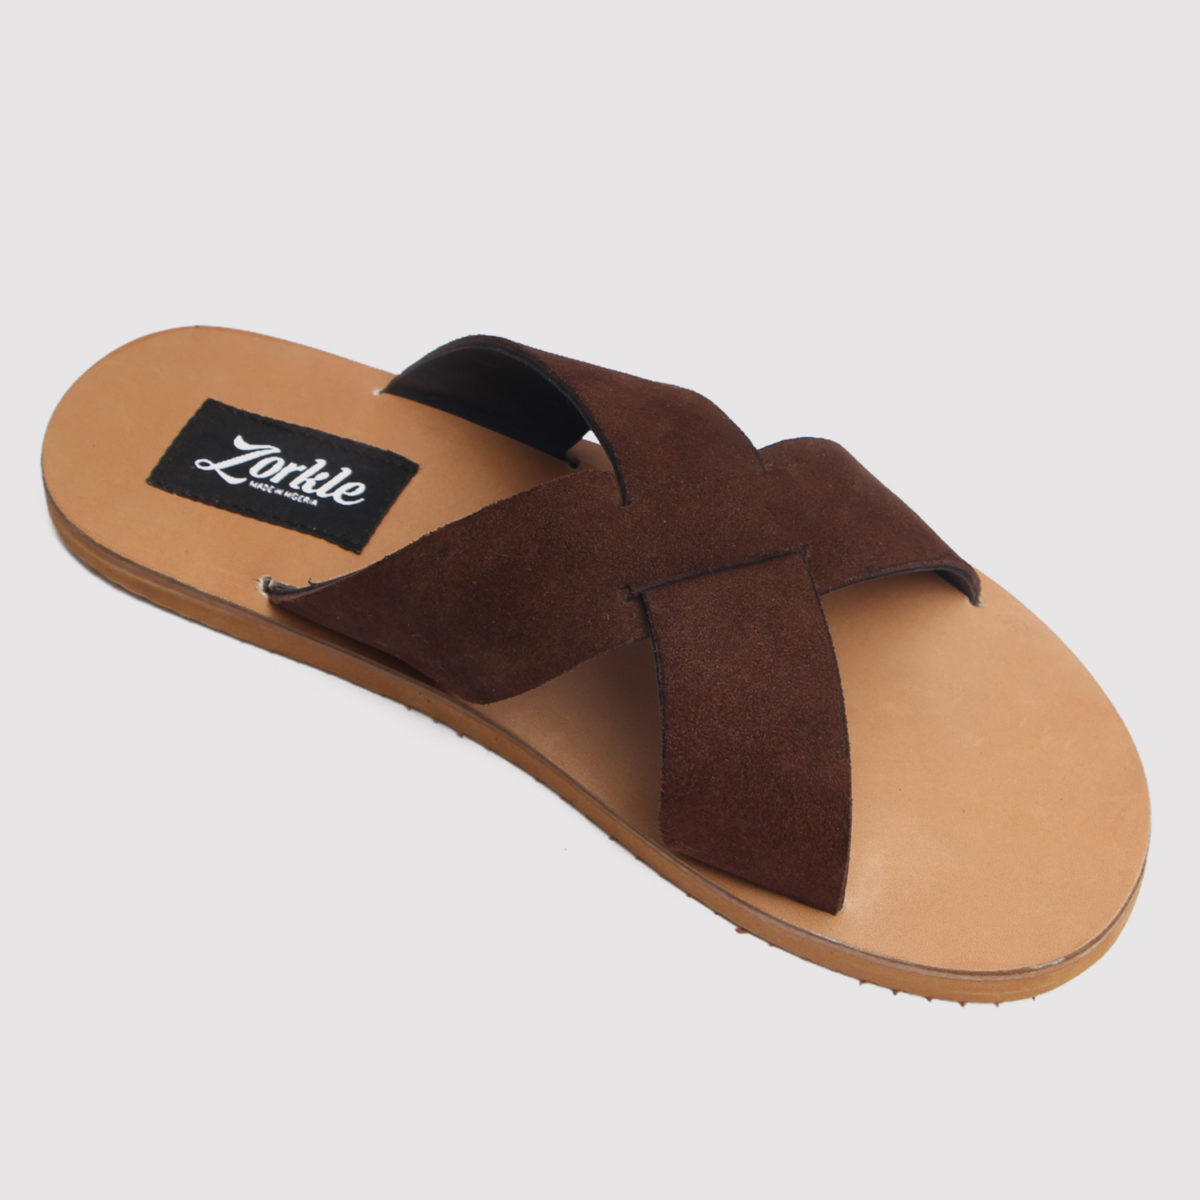 Maiden cross slippers brown suede zorkles shoes in nigeria